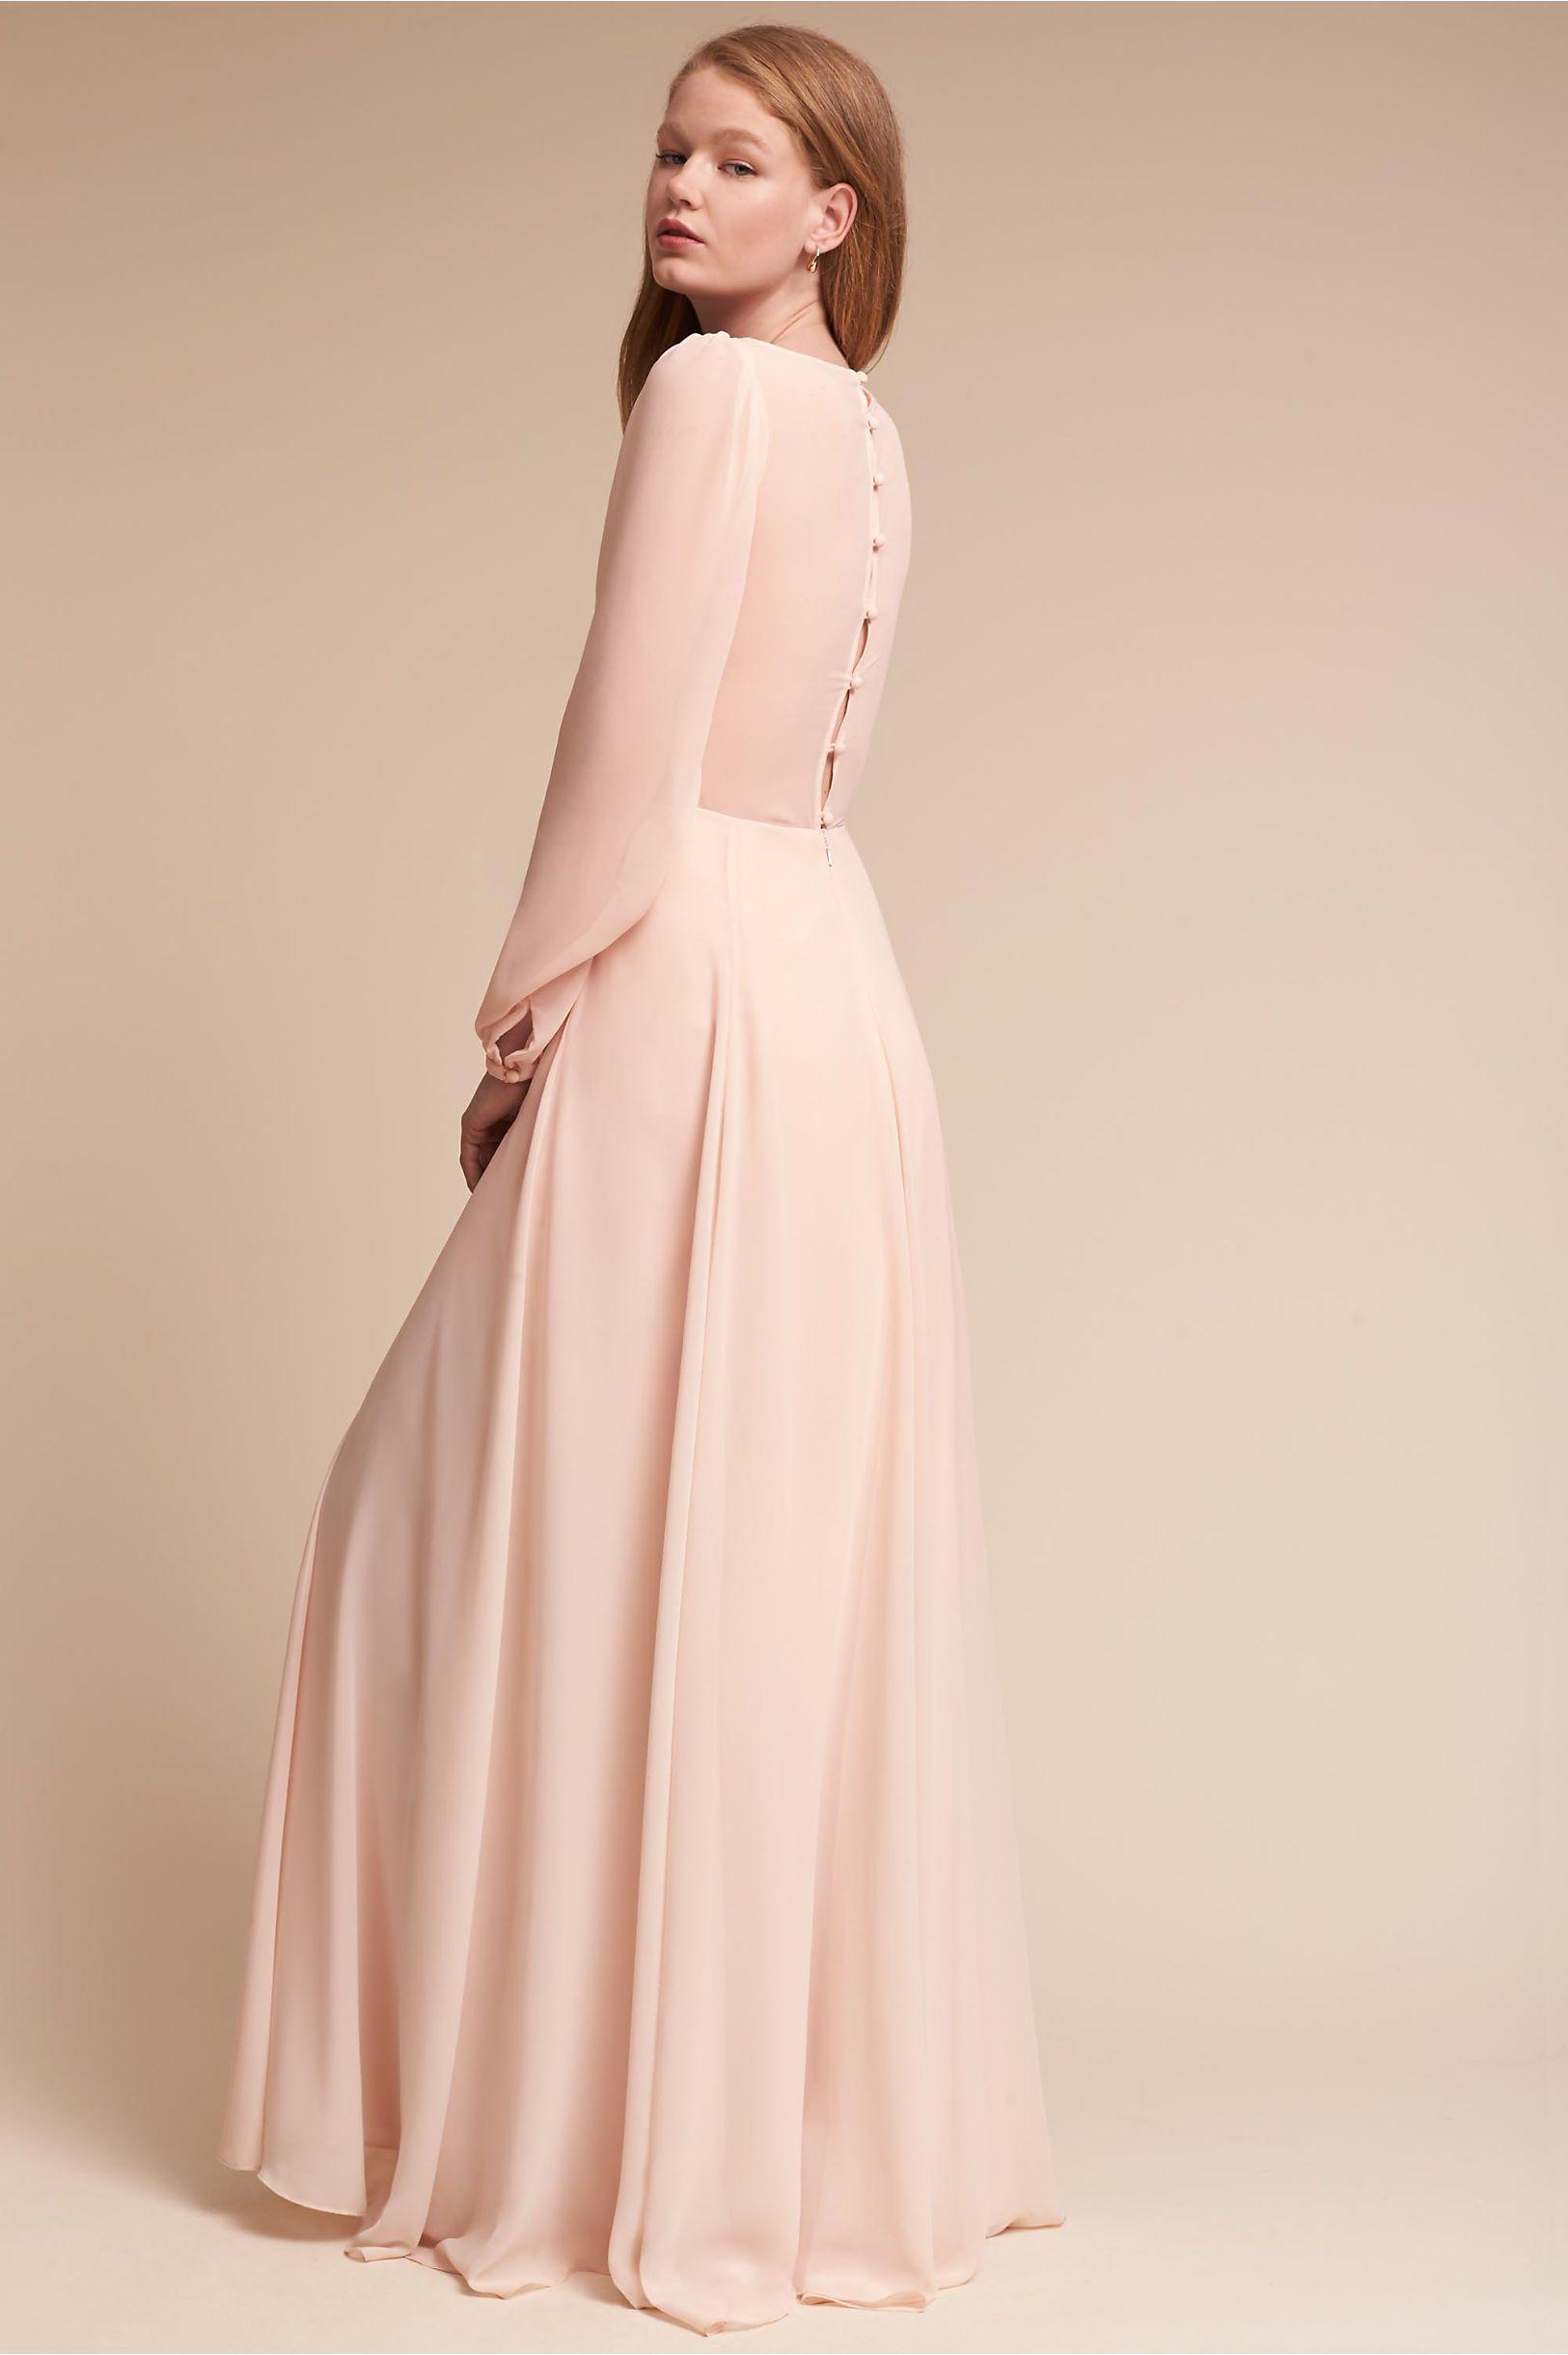 Bhldn nova dress ice pink in bridal party bhldn waterford bhldn nova dress ice pink in bridal party bhldn ombrellifo Choice Image